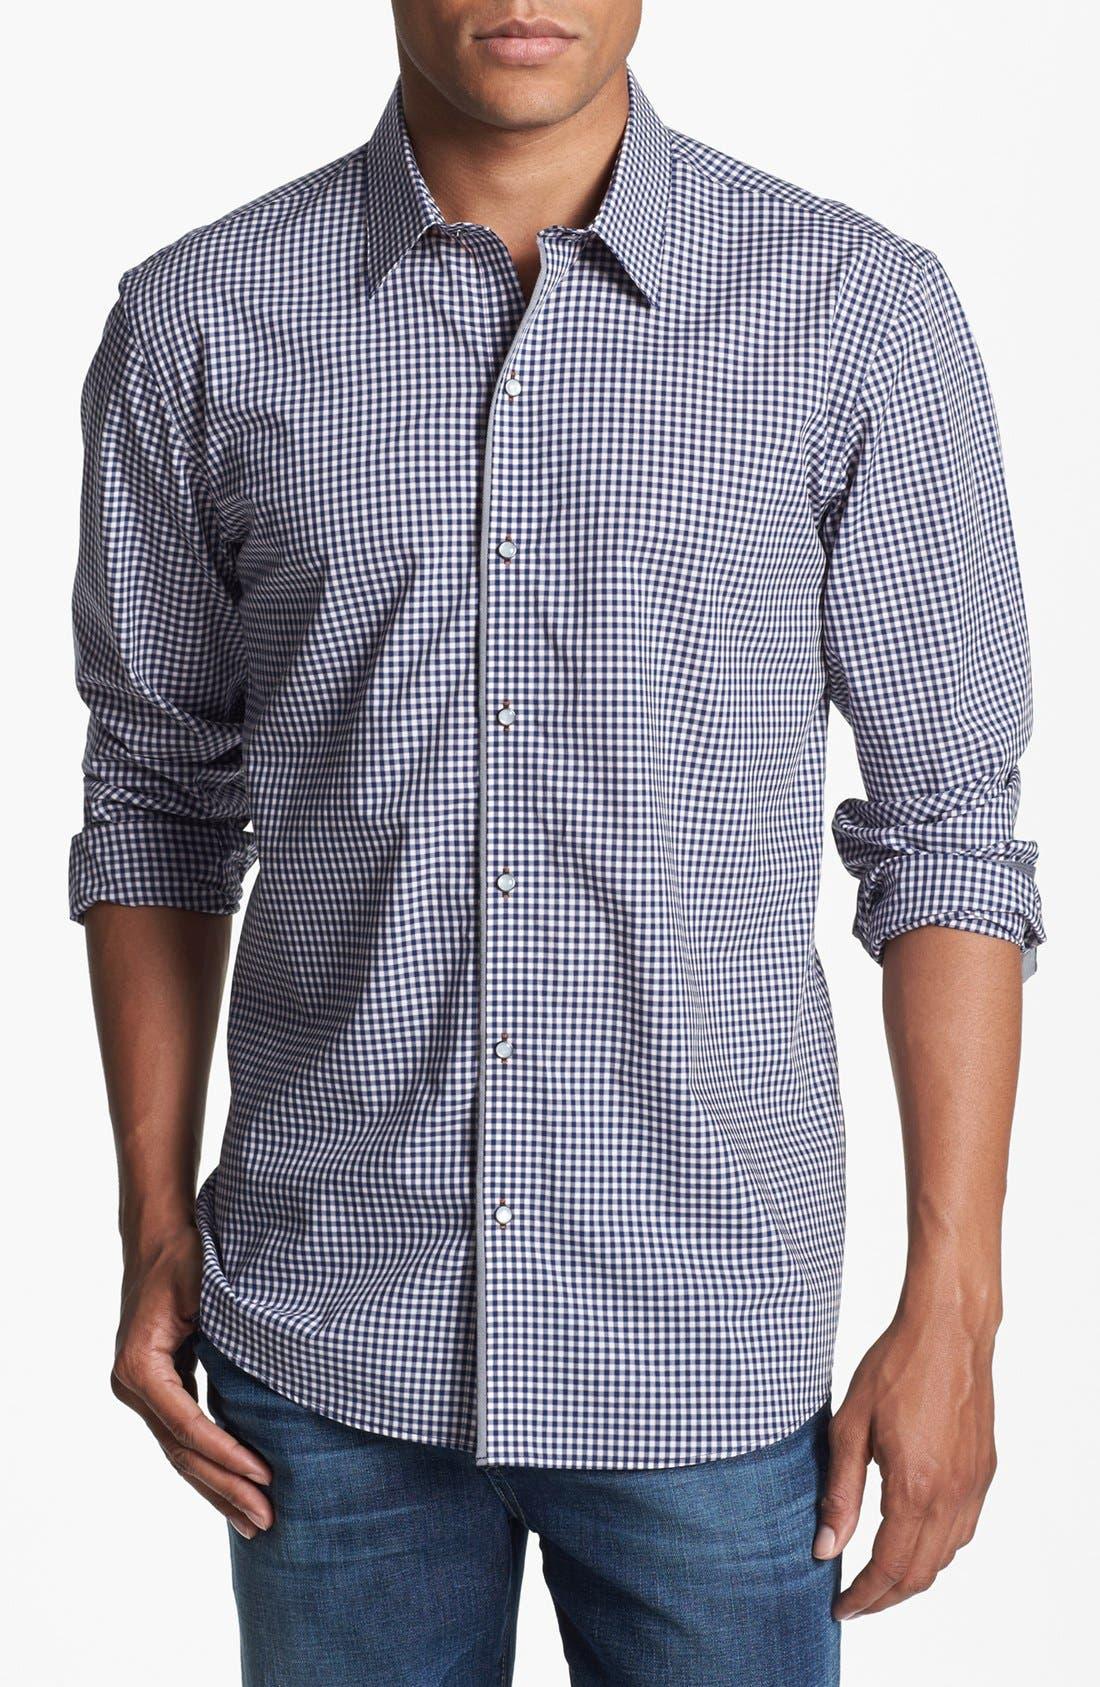 Alternate Image 1 Selected - 7 Diamonds 'Good Time' Gingham Trim Fit Cotton Sport Shirt